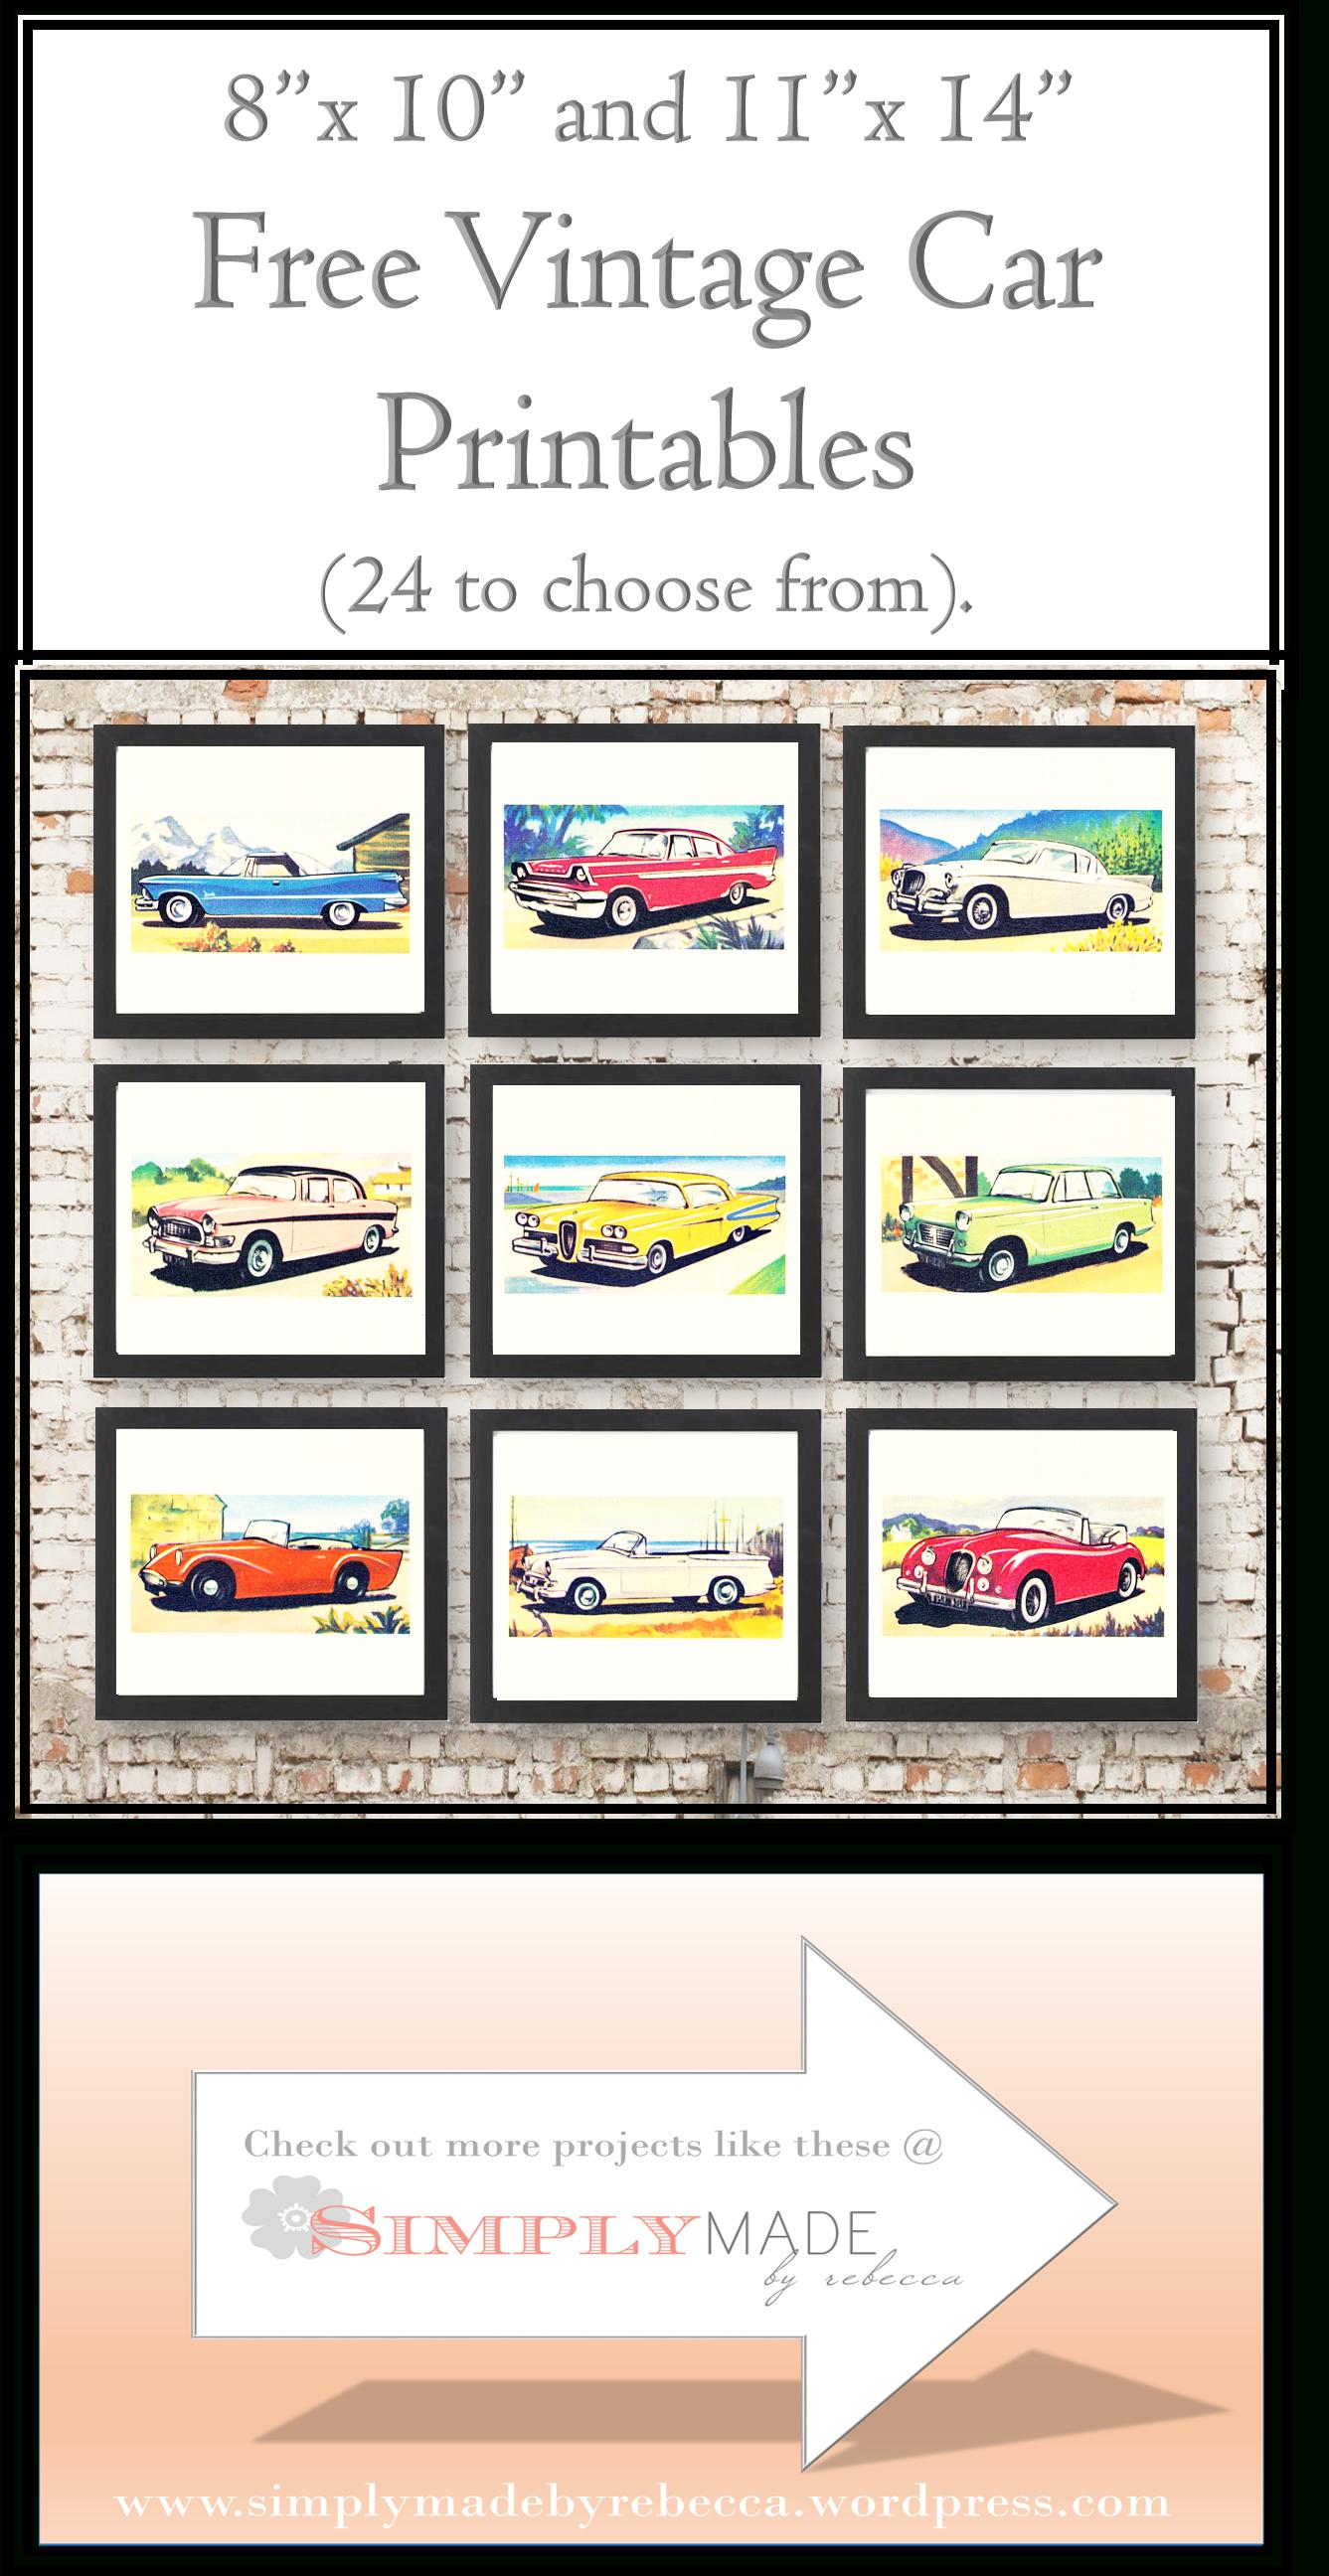 Free Vintage Car Printables | Cards - Downloadable Resources - Free Printable Nursery Resources